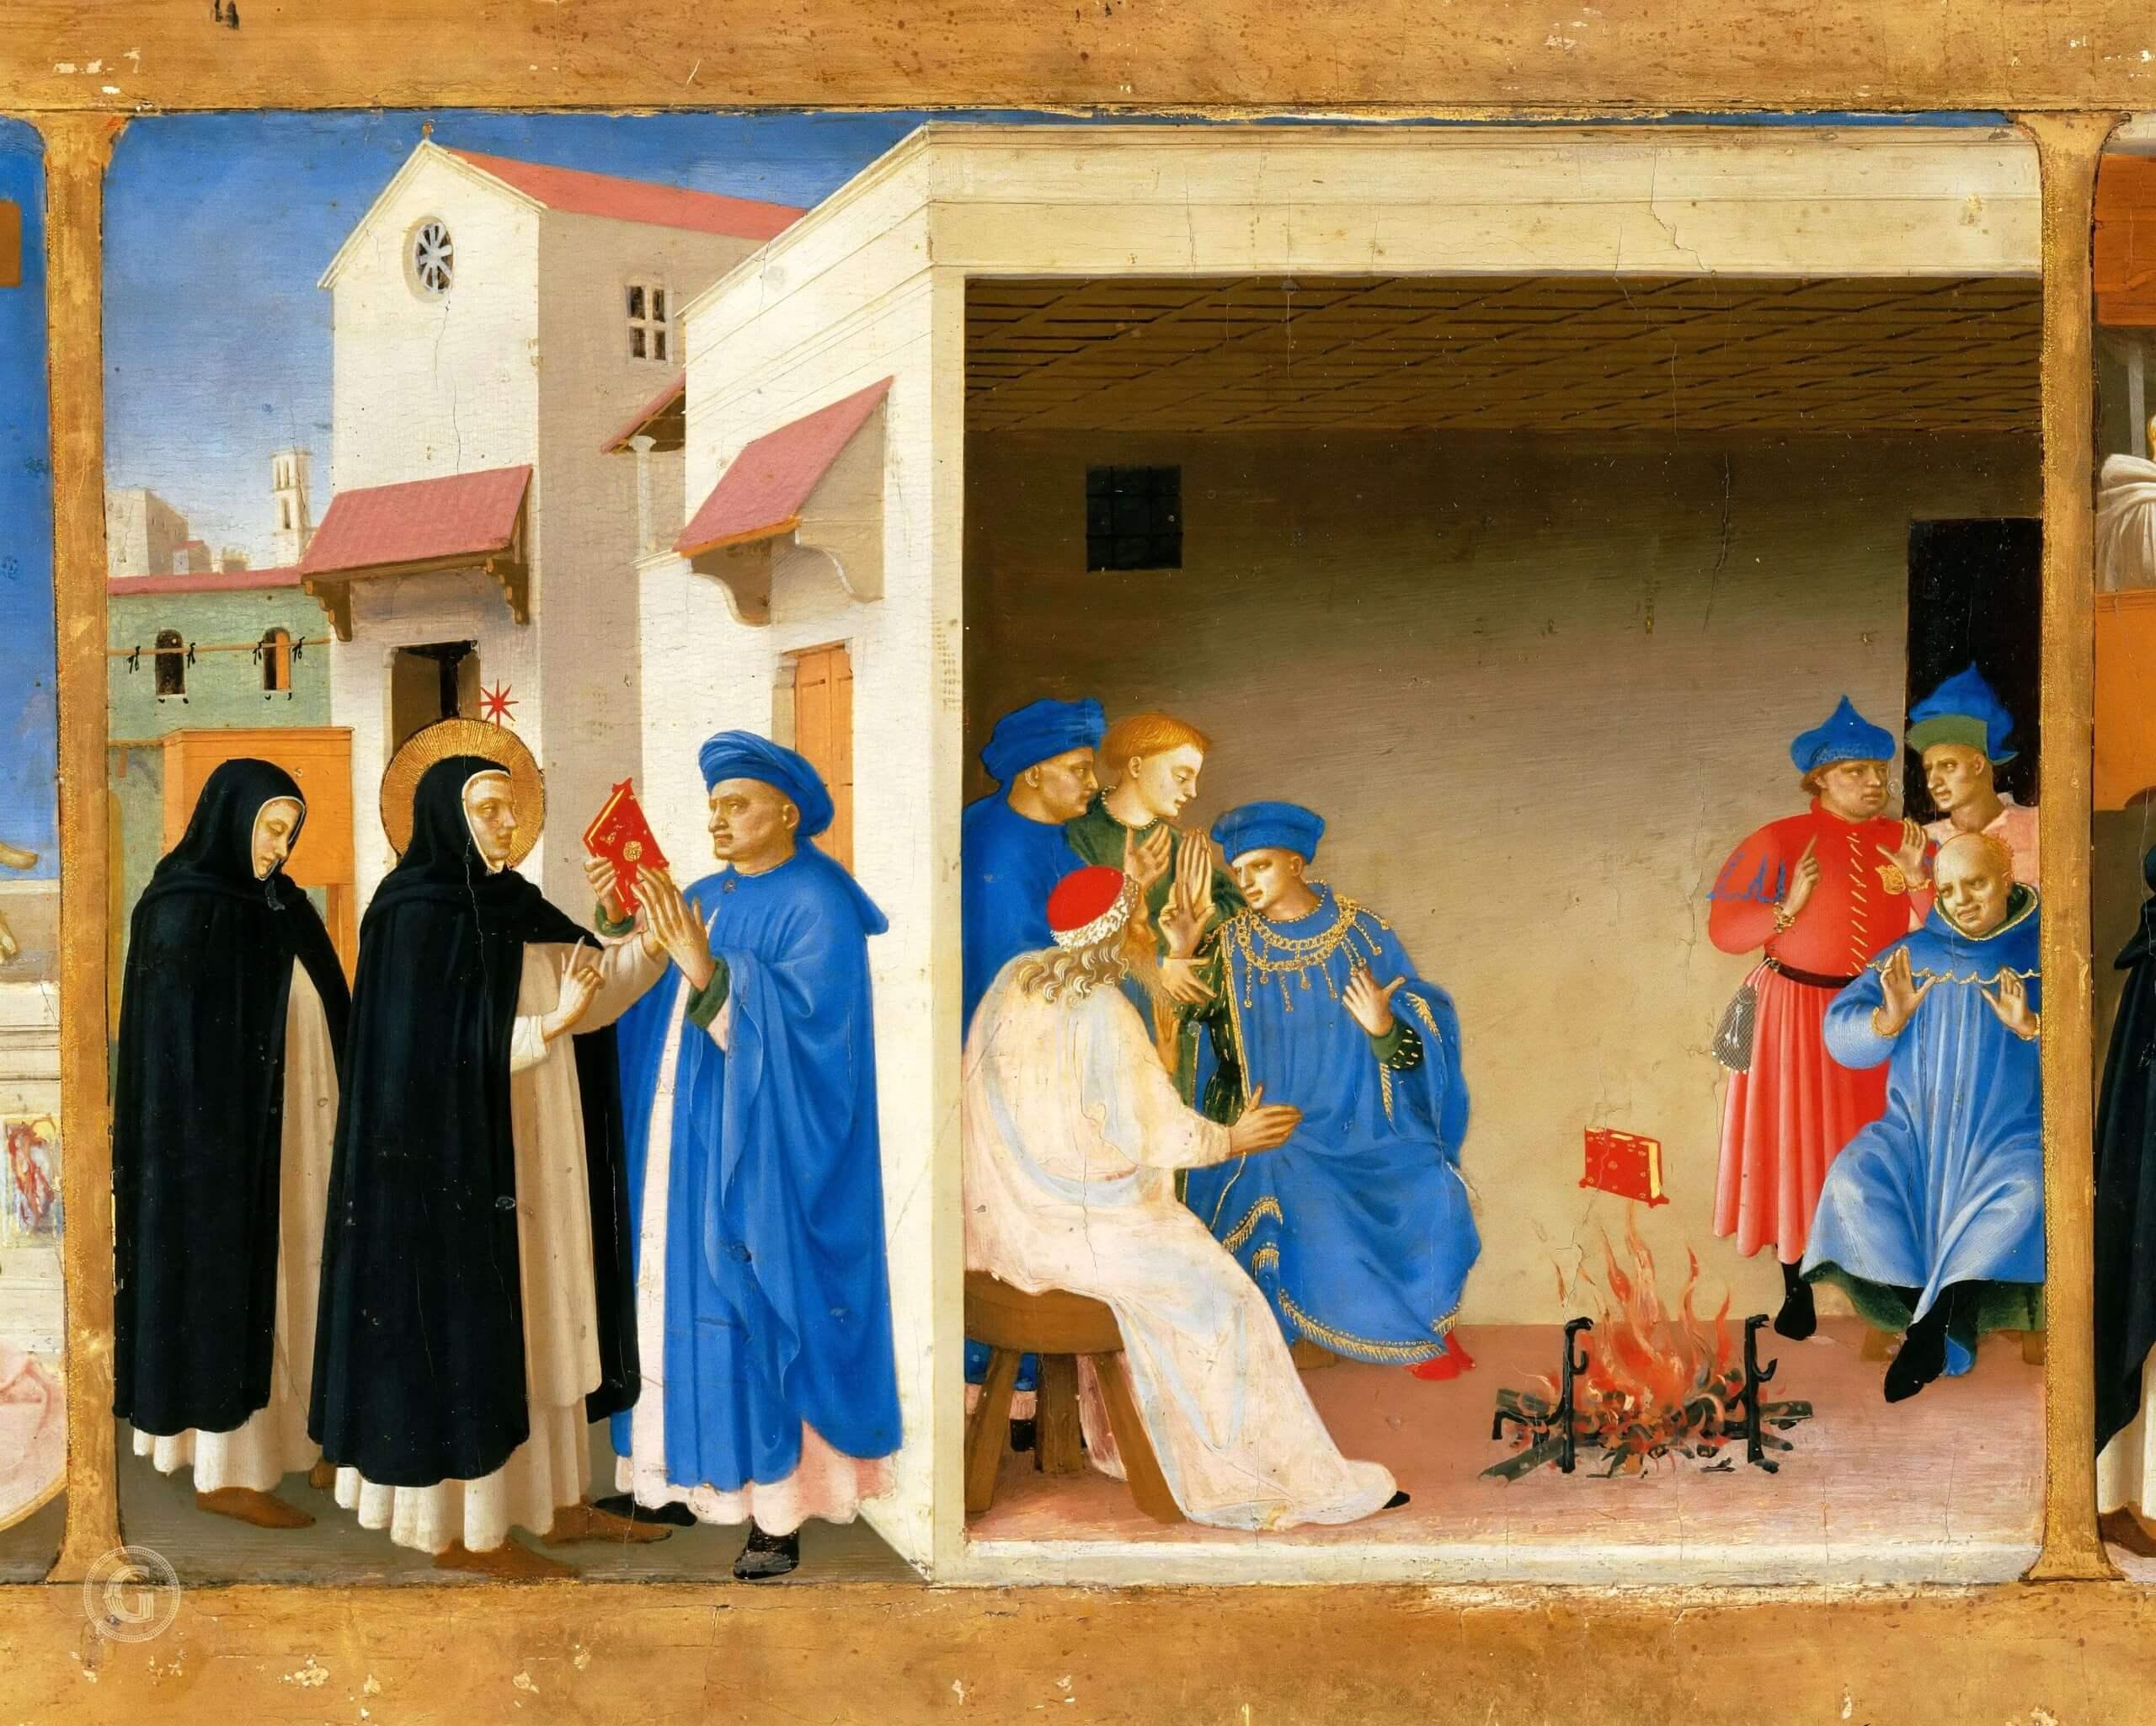 Фра Беато Анджелико. Проповедь св. Доминика иЧудо скнигой, 1435г.